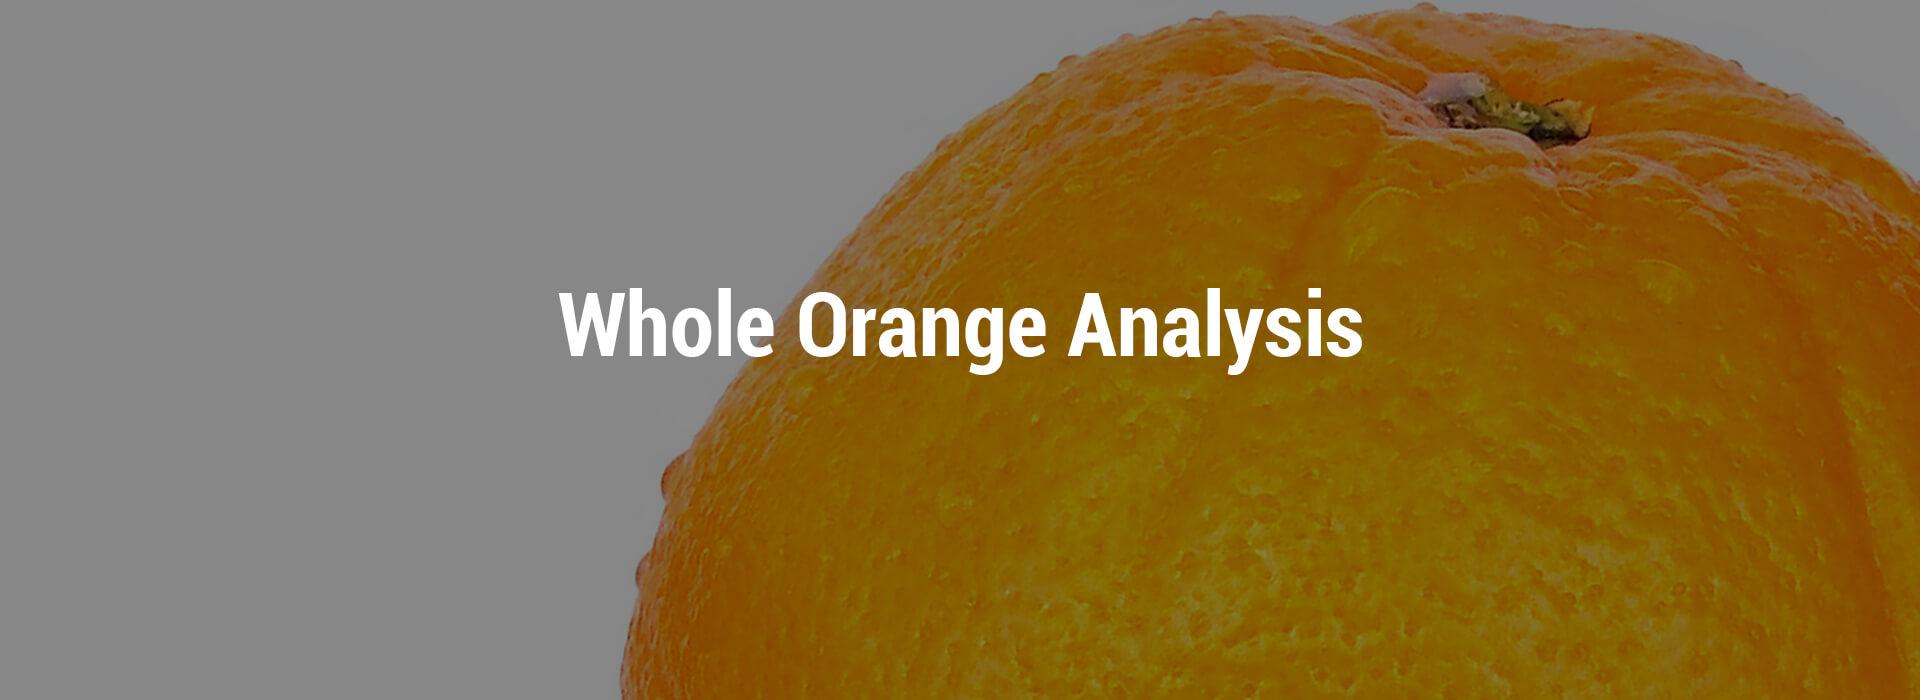 LVHS-whole-orange-header-1